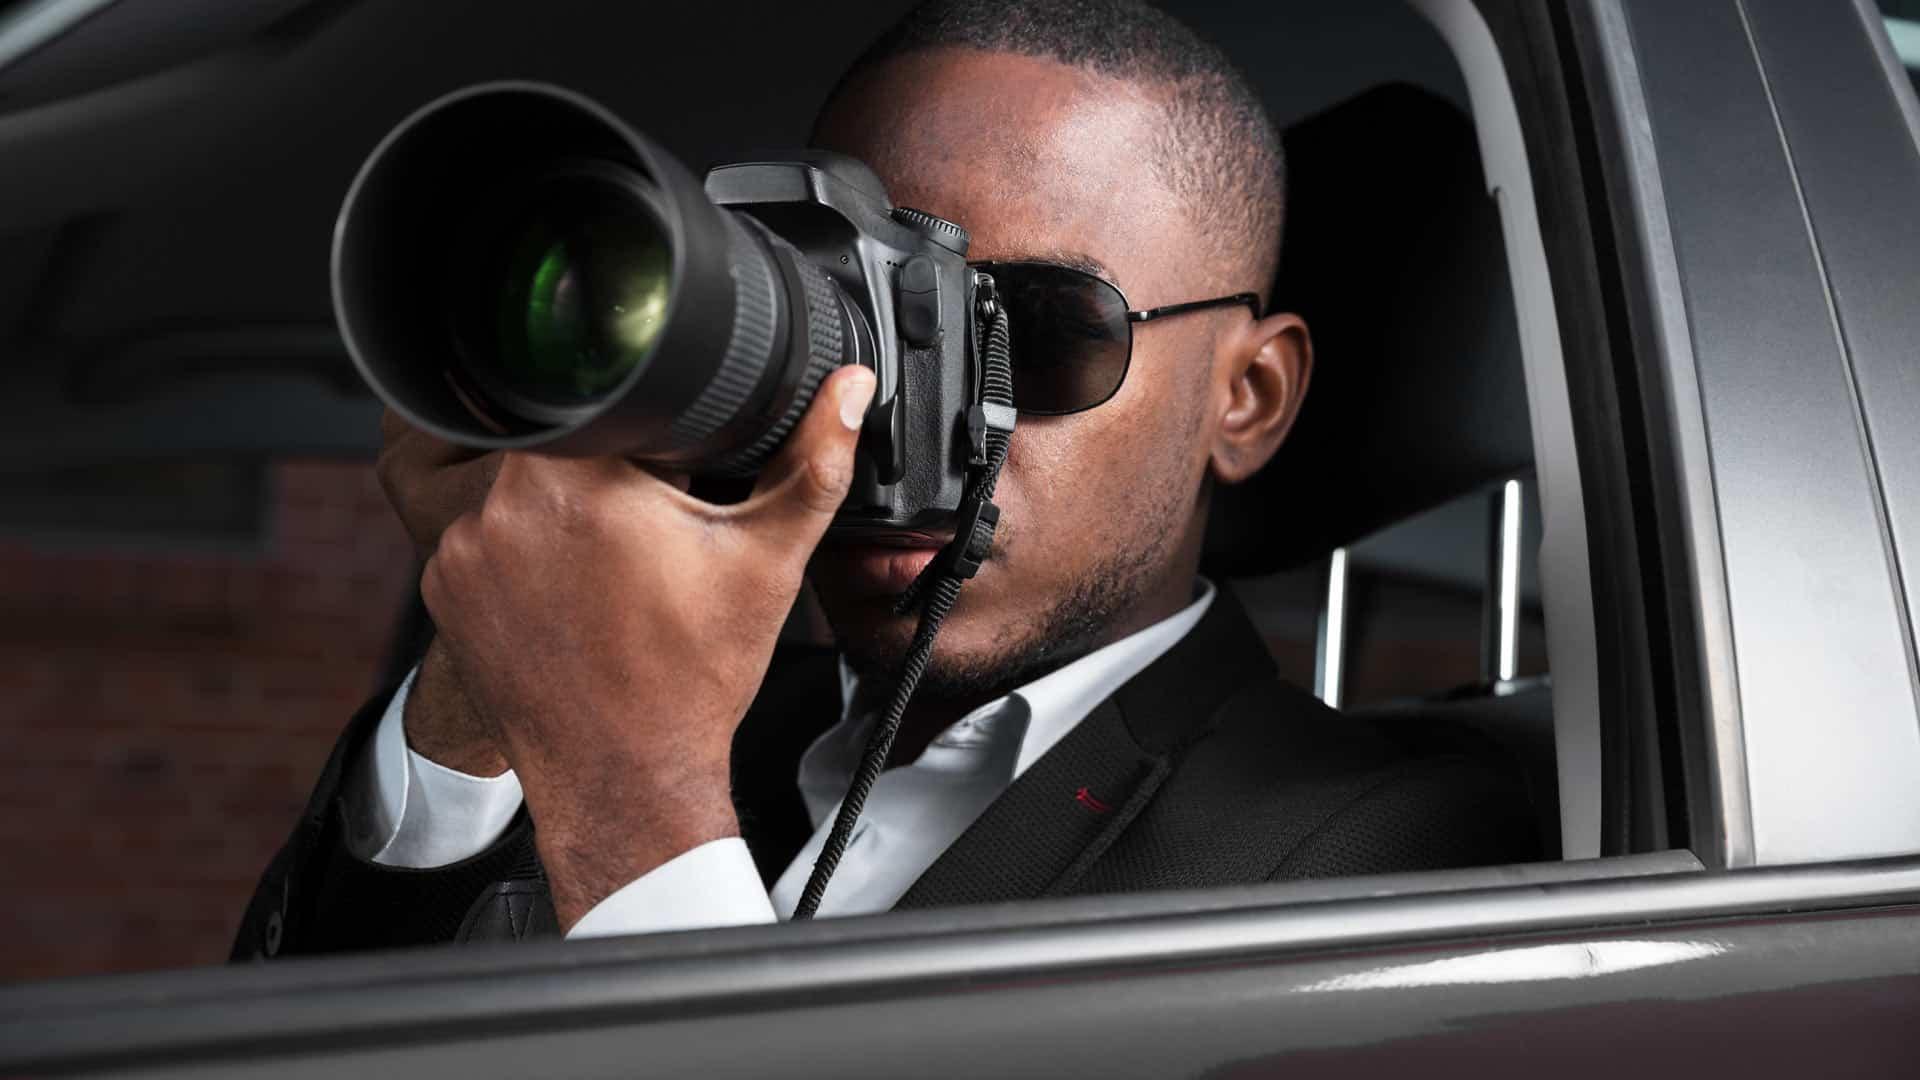 Private Investigator taking photos NYC